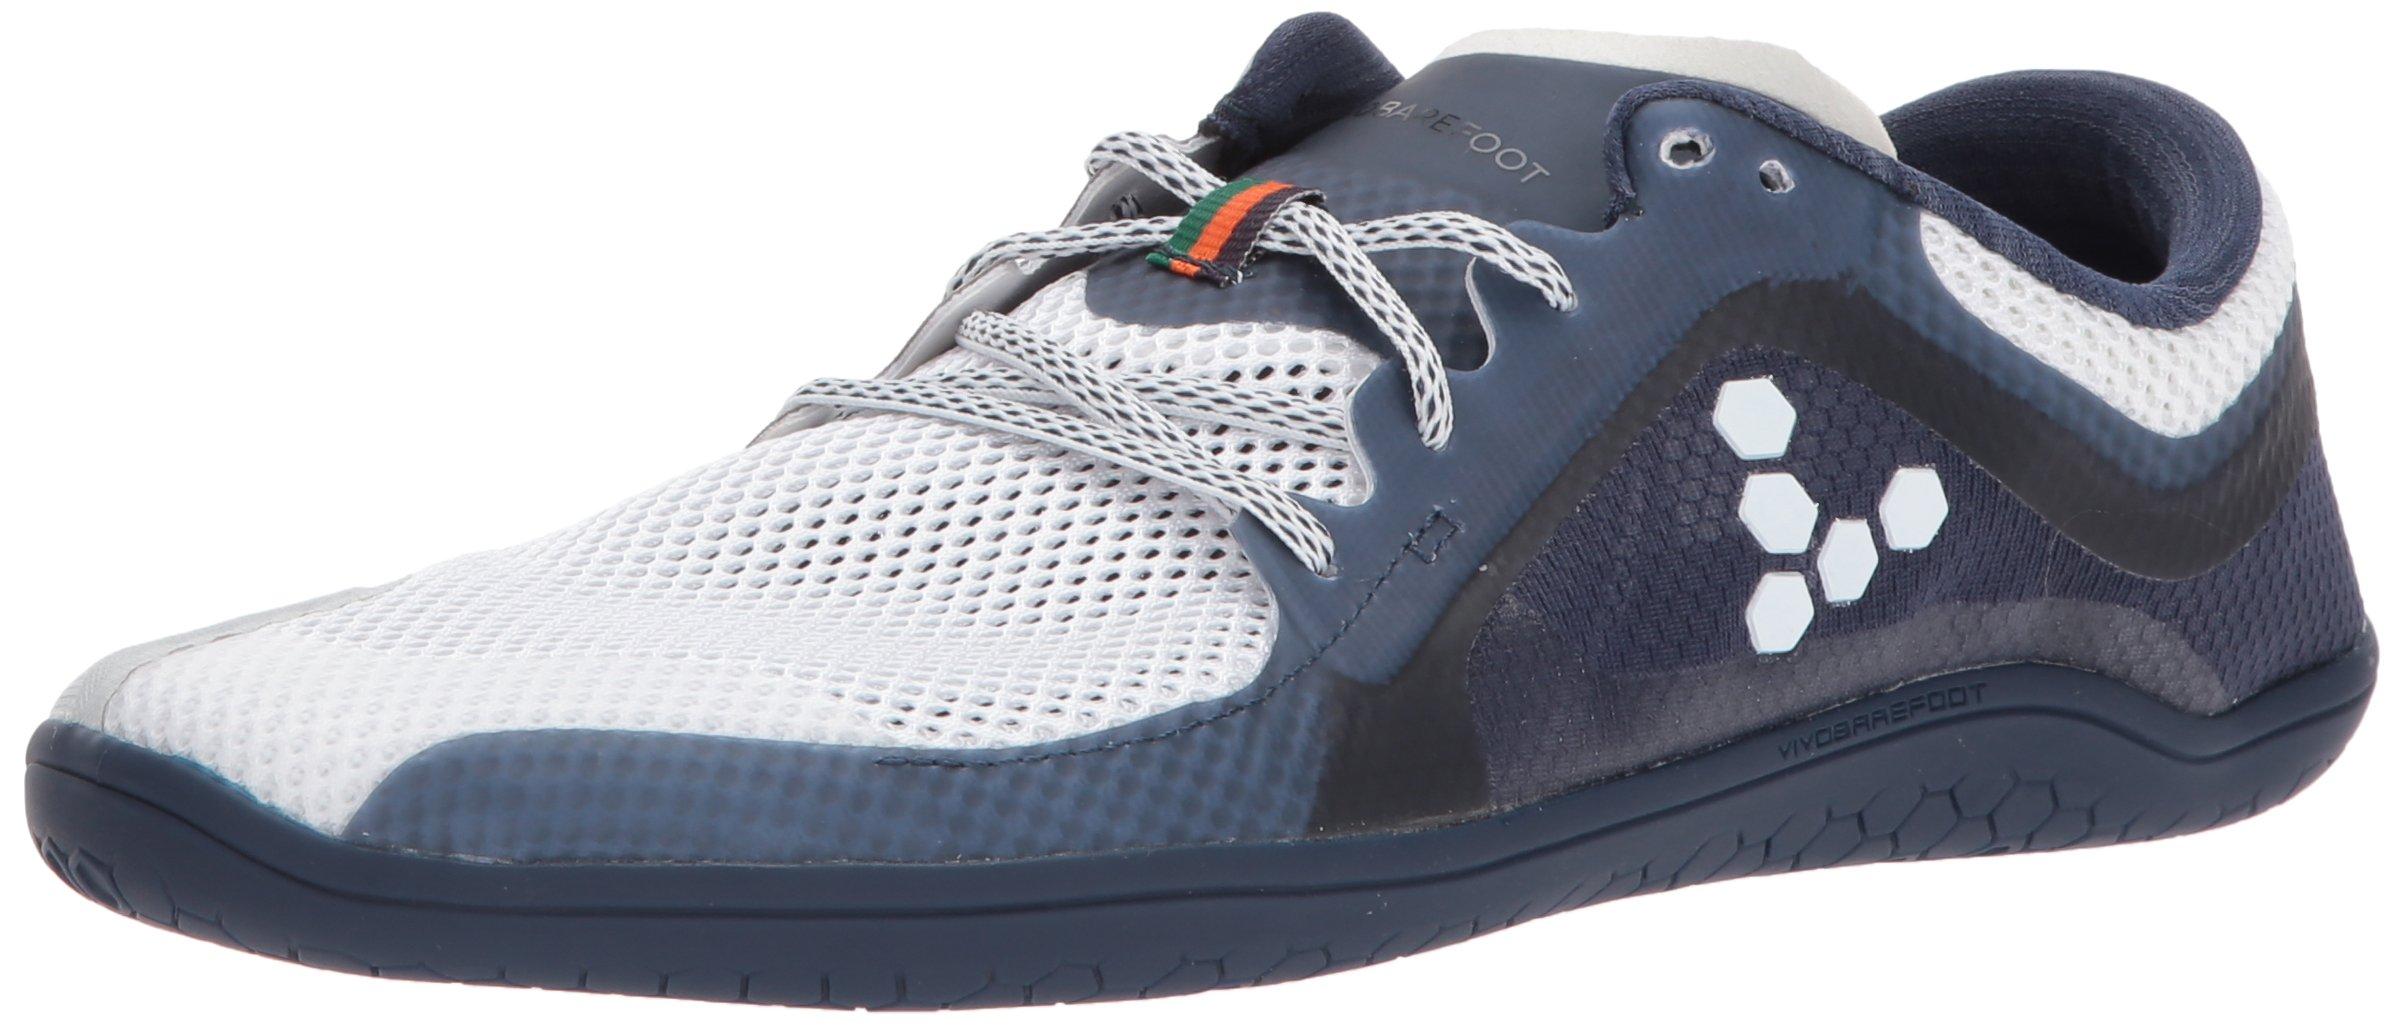 Vivobarefoot Women's Primus Lite Running Trainer Shoe, Iffley, 38 D EU (7.5 US)